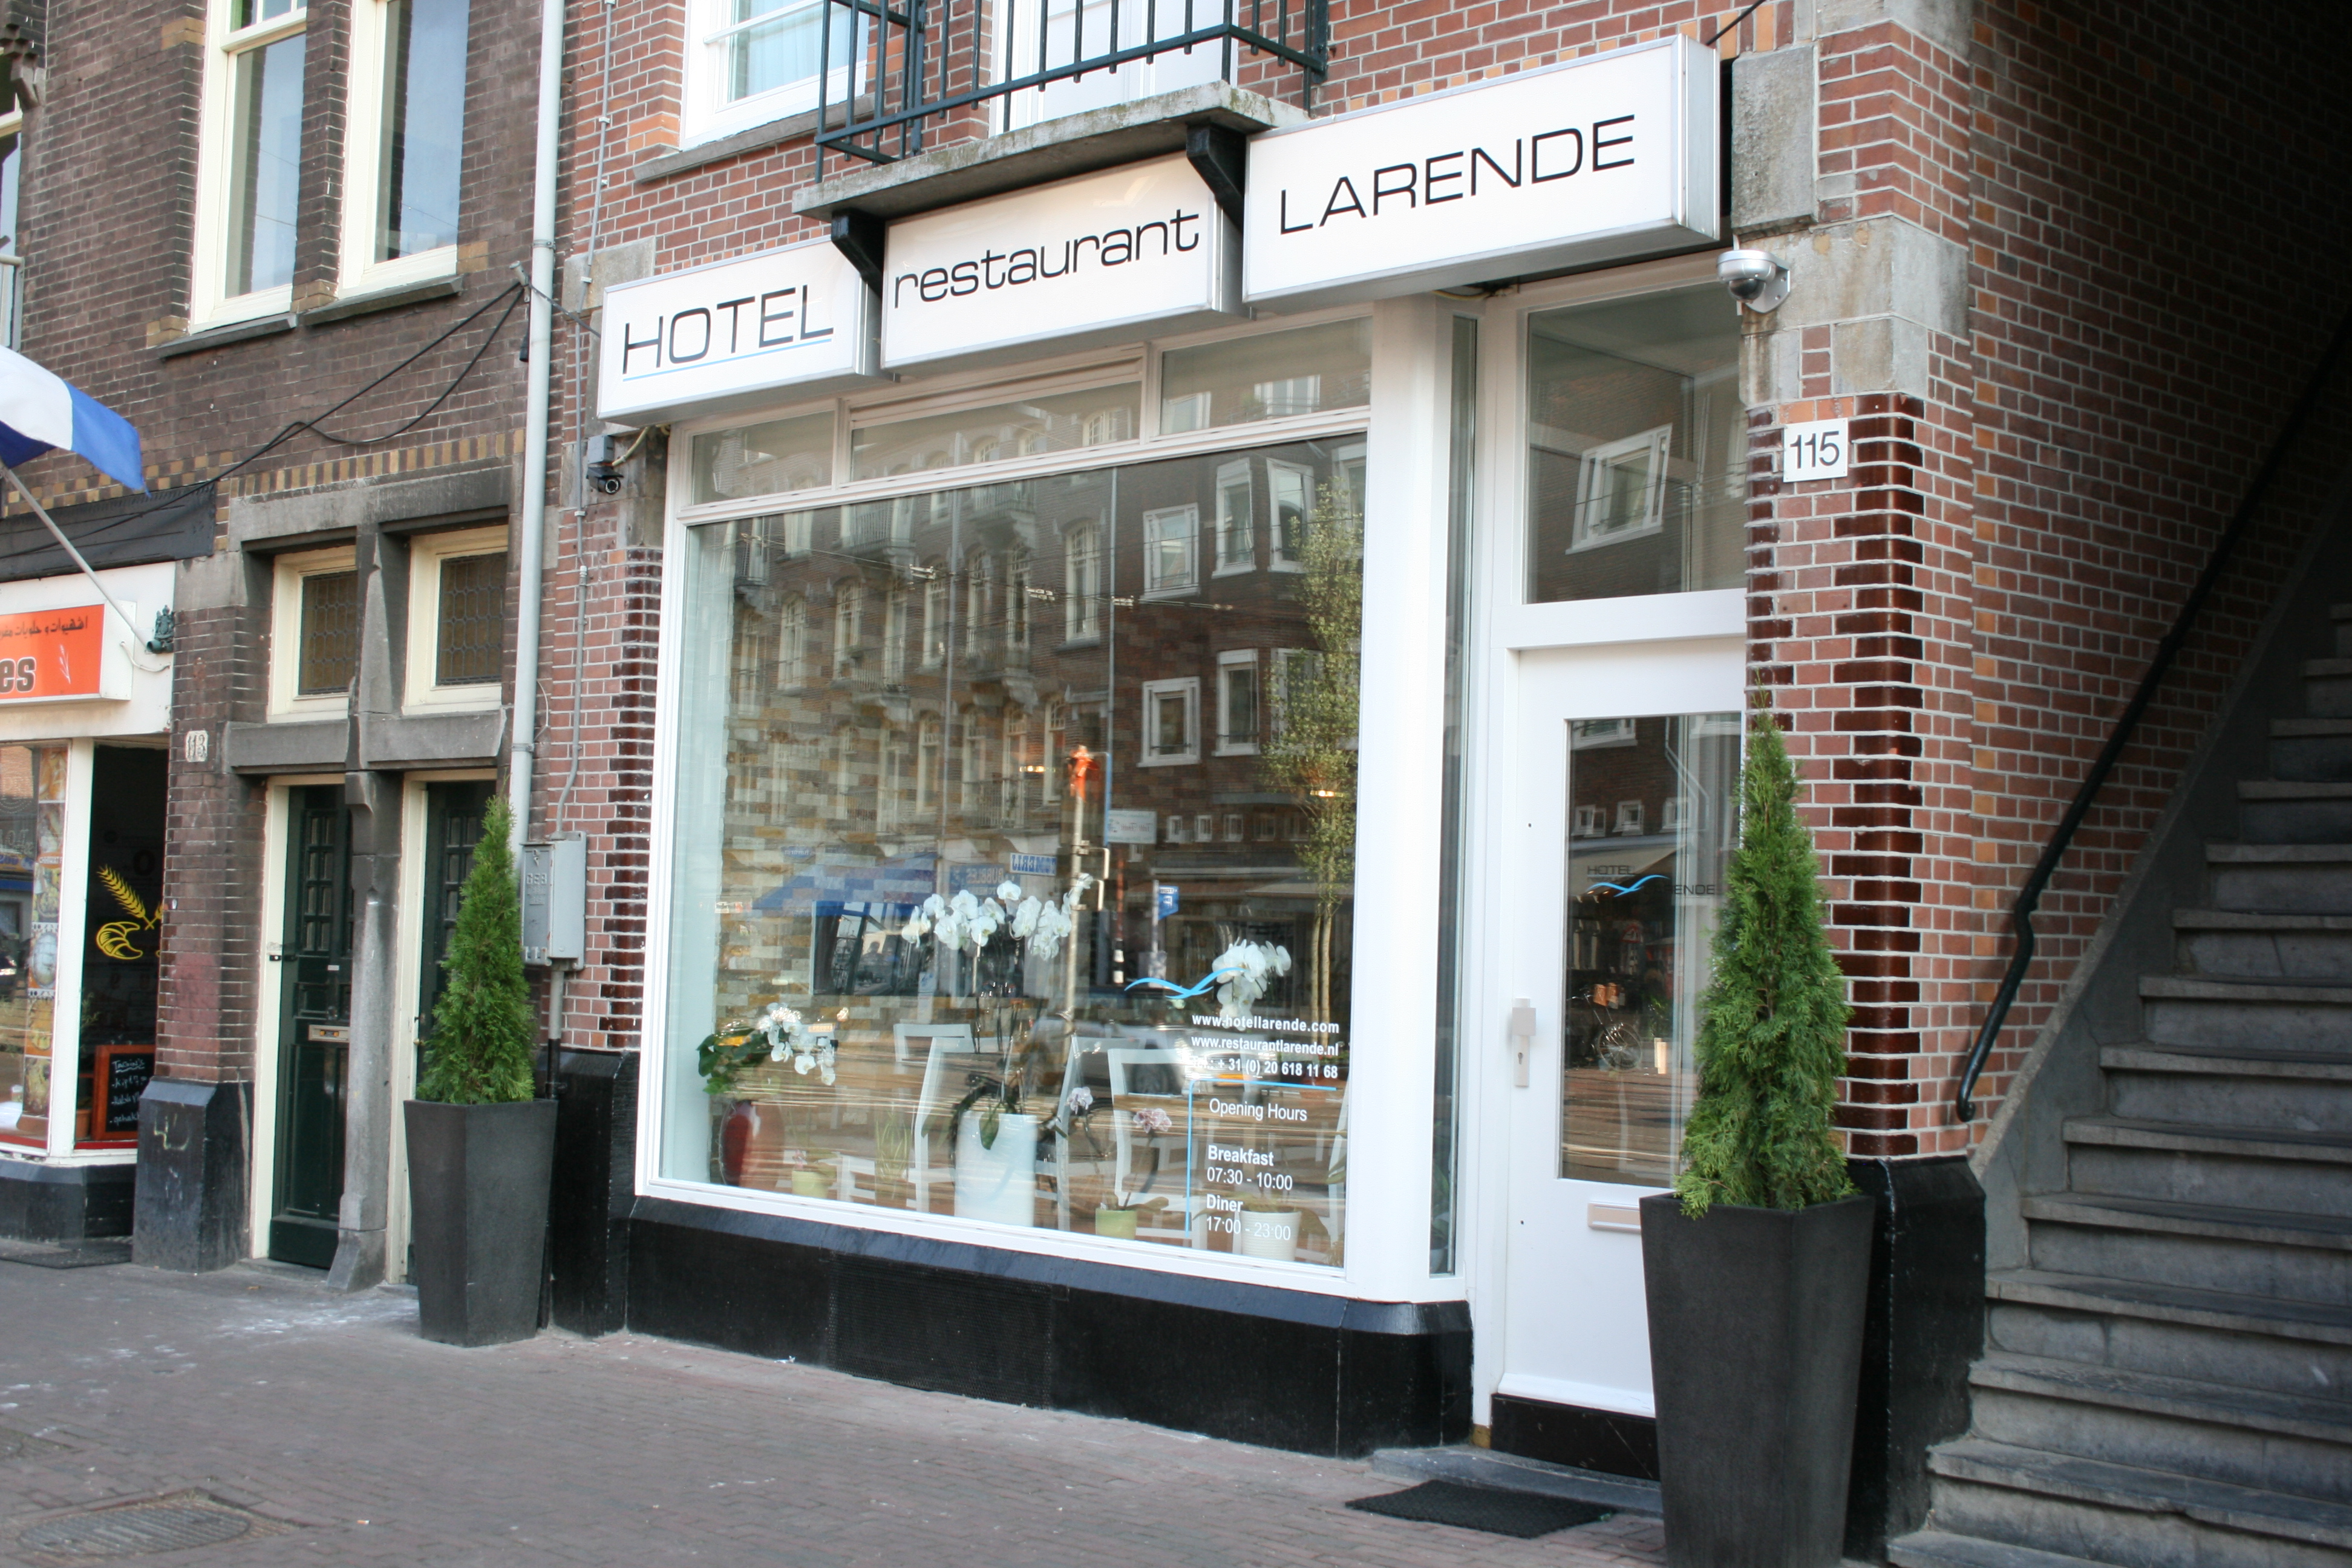 Hotel Restaurant Larende